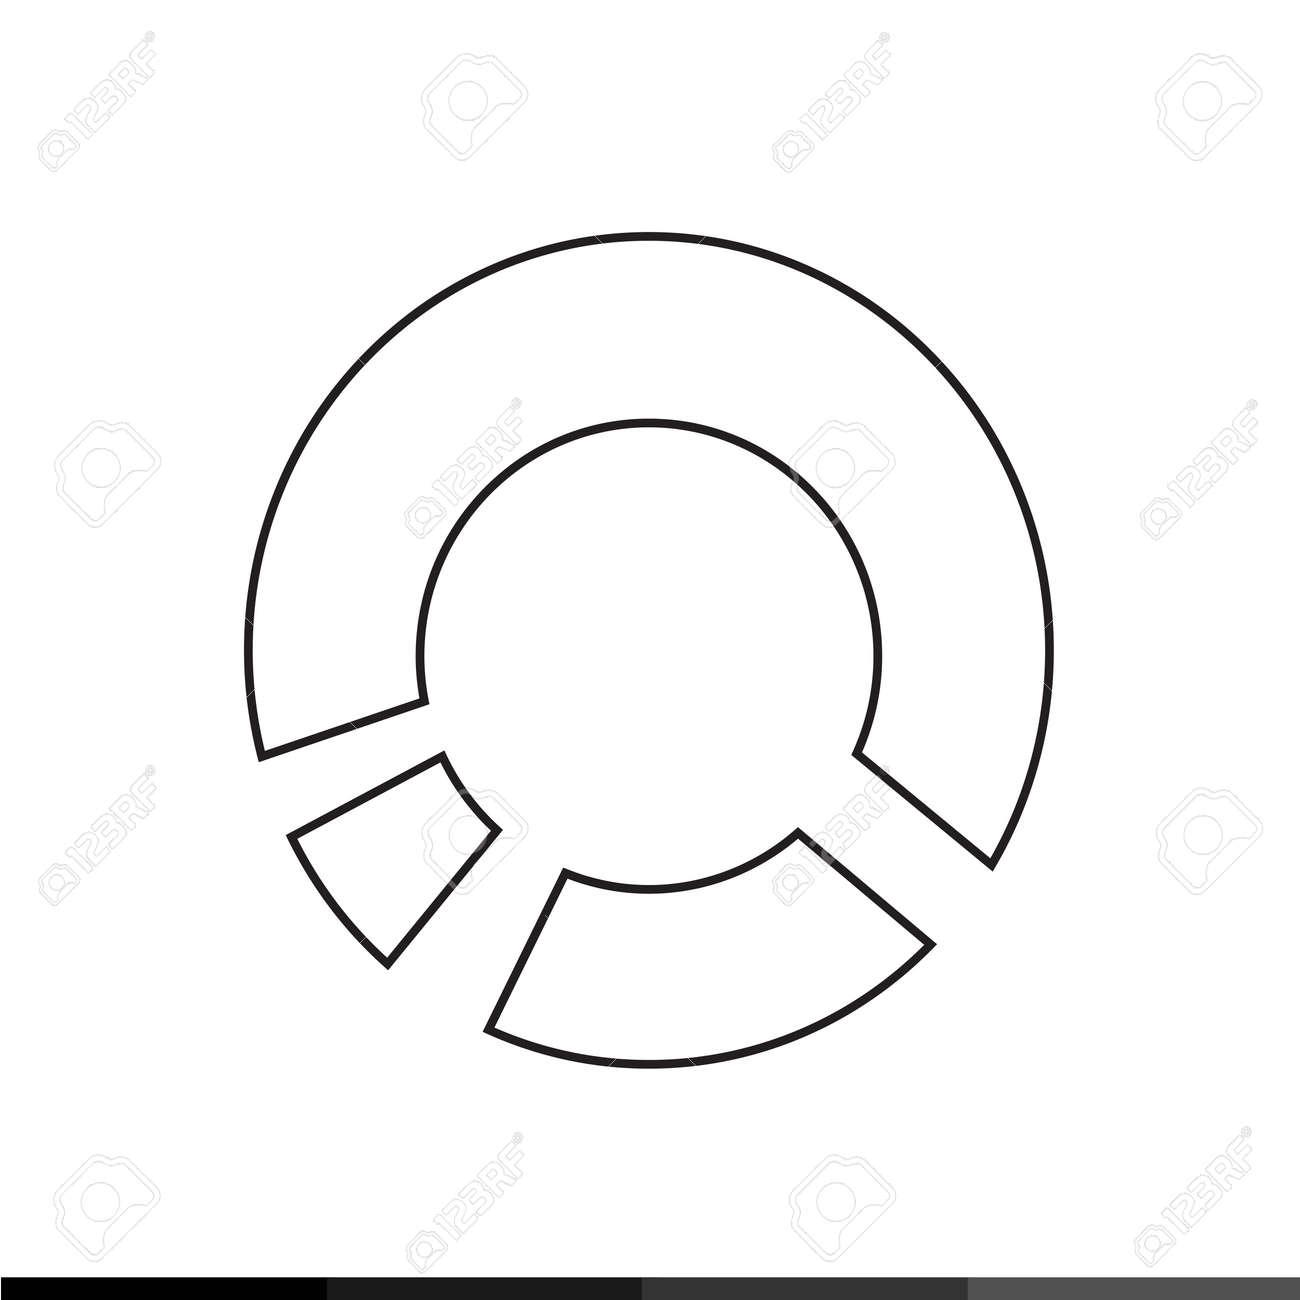 diagram icon graphs icon illustration design royalty free cliparts Gauge Icon diagram icon graphs icon illustration design stock vector 56274924